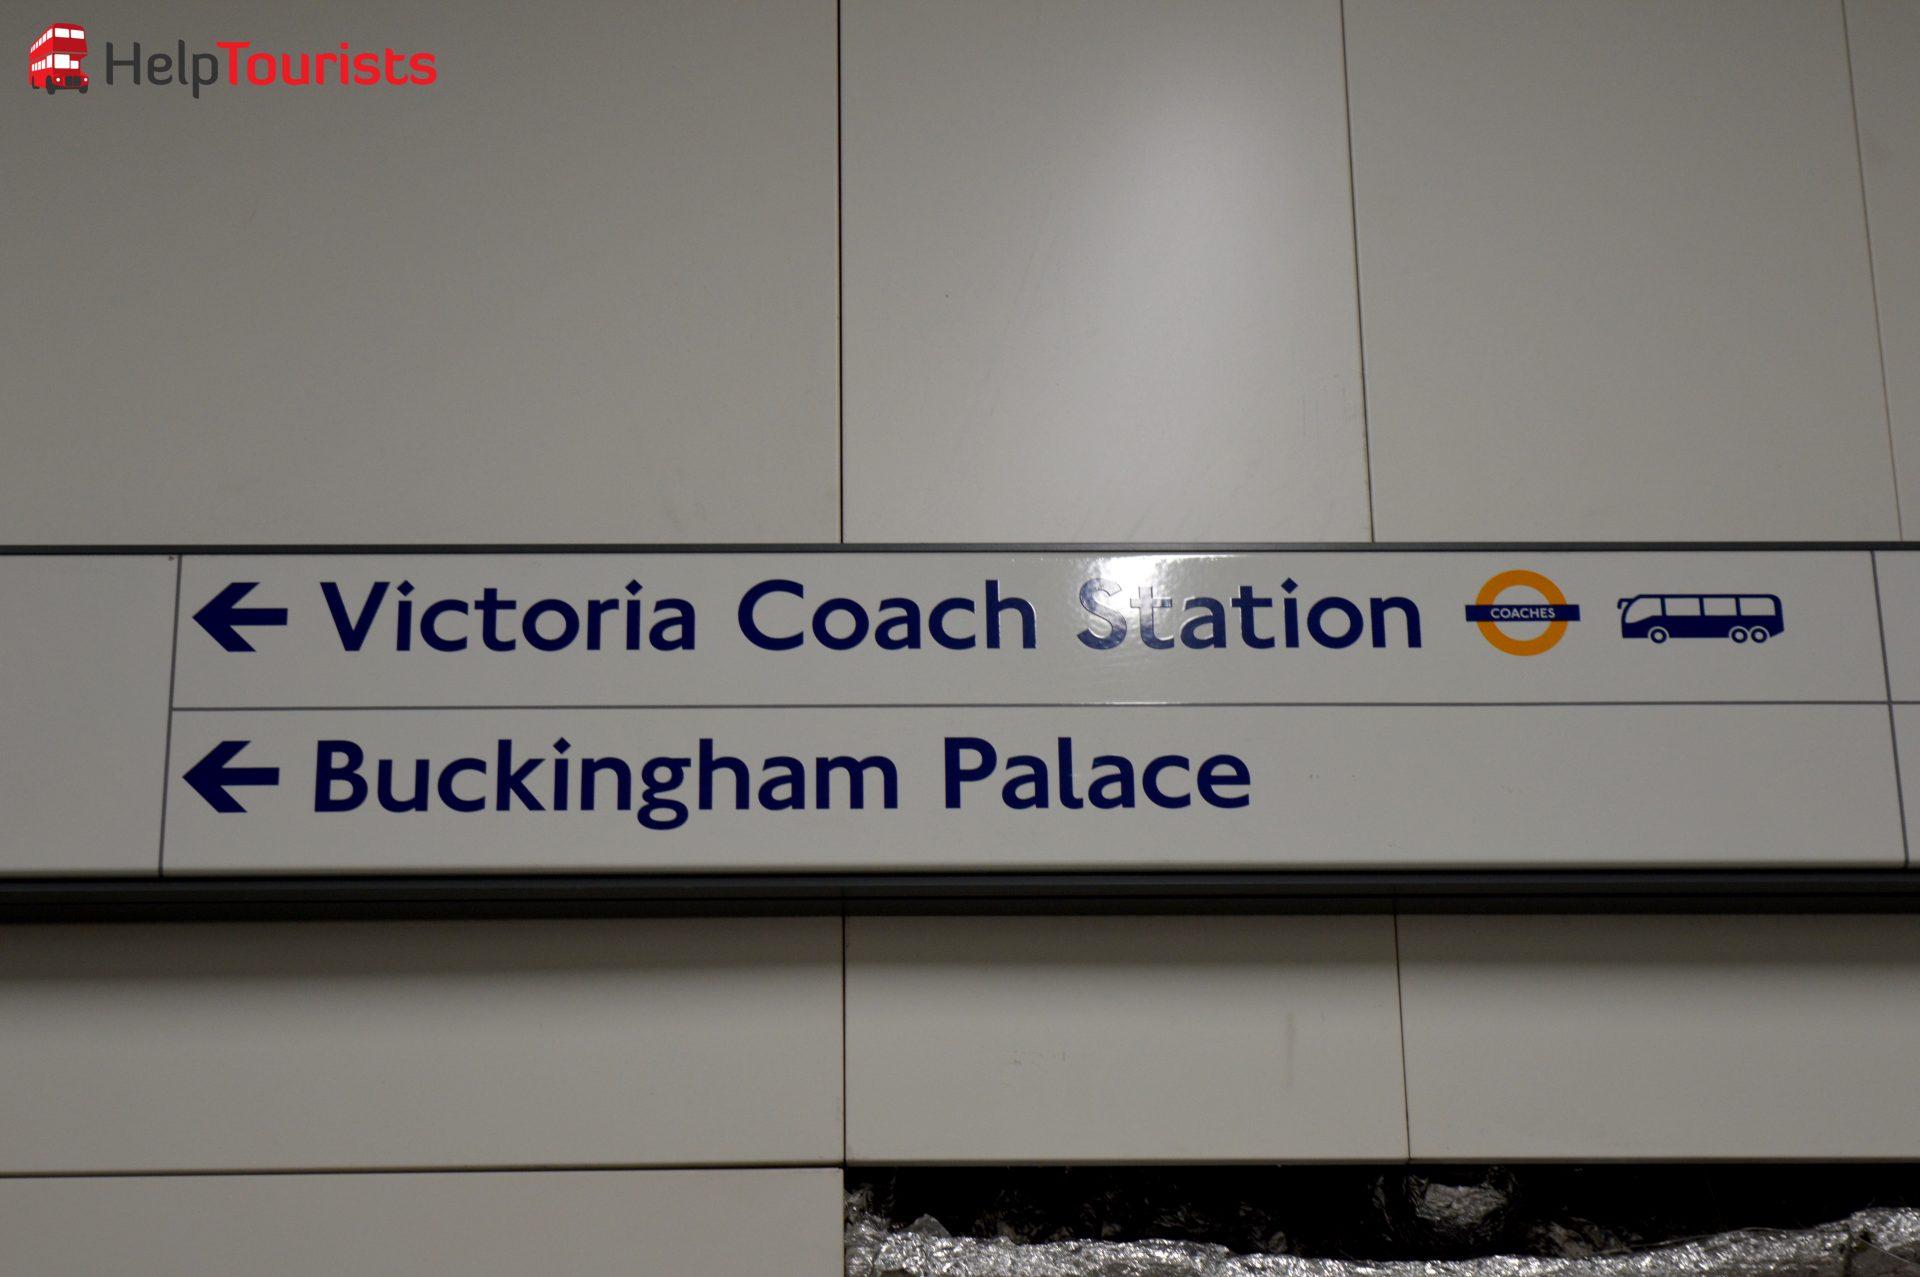 London VIctoria Station zum Buckingham Palace